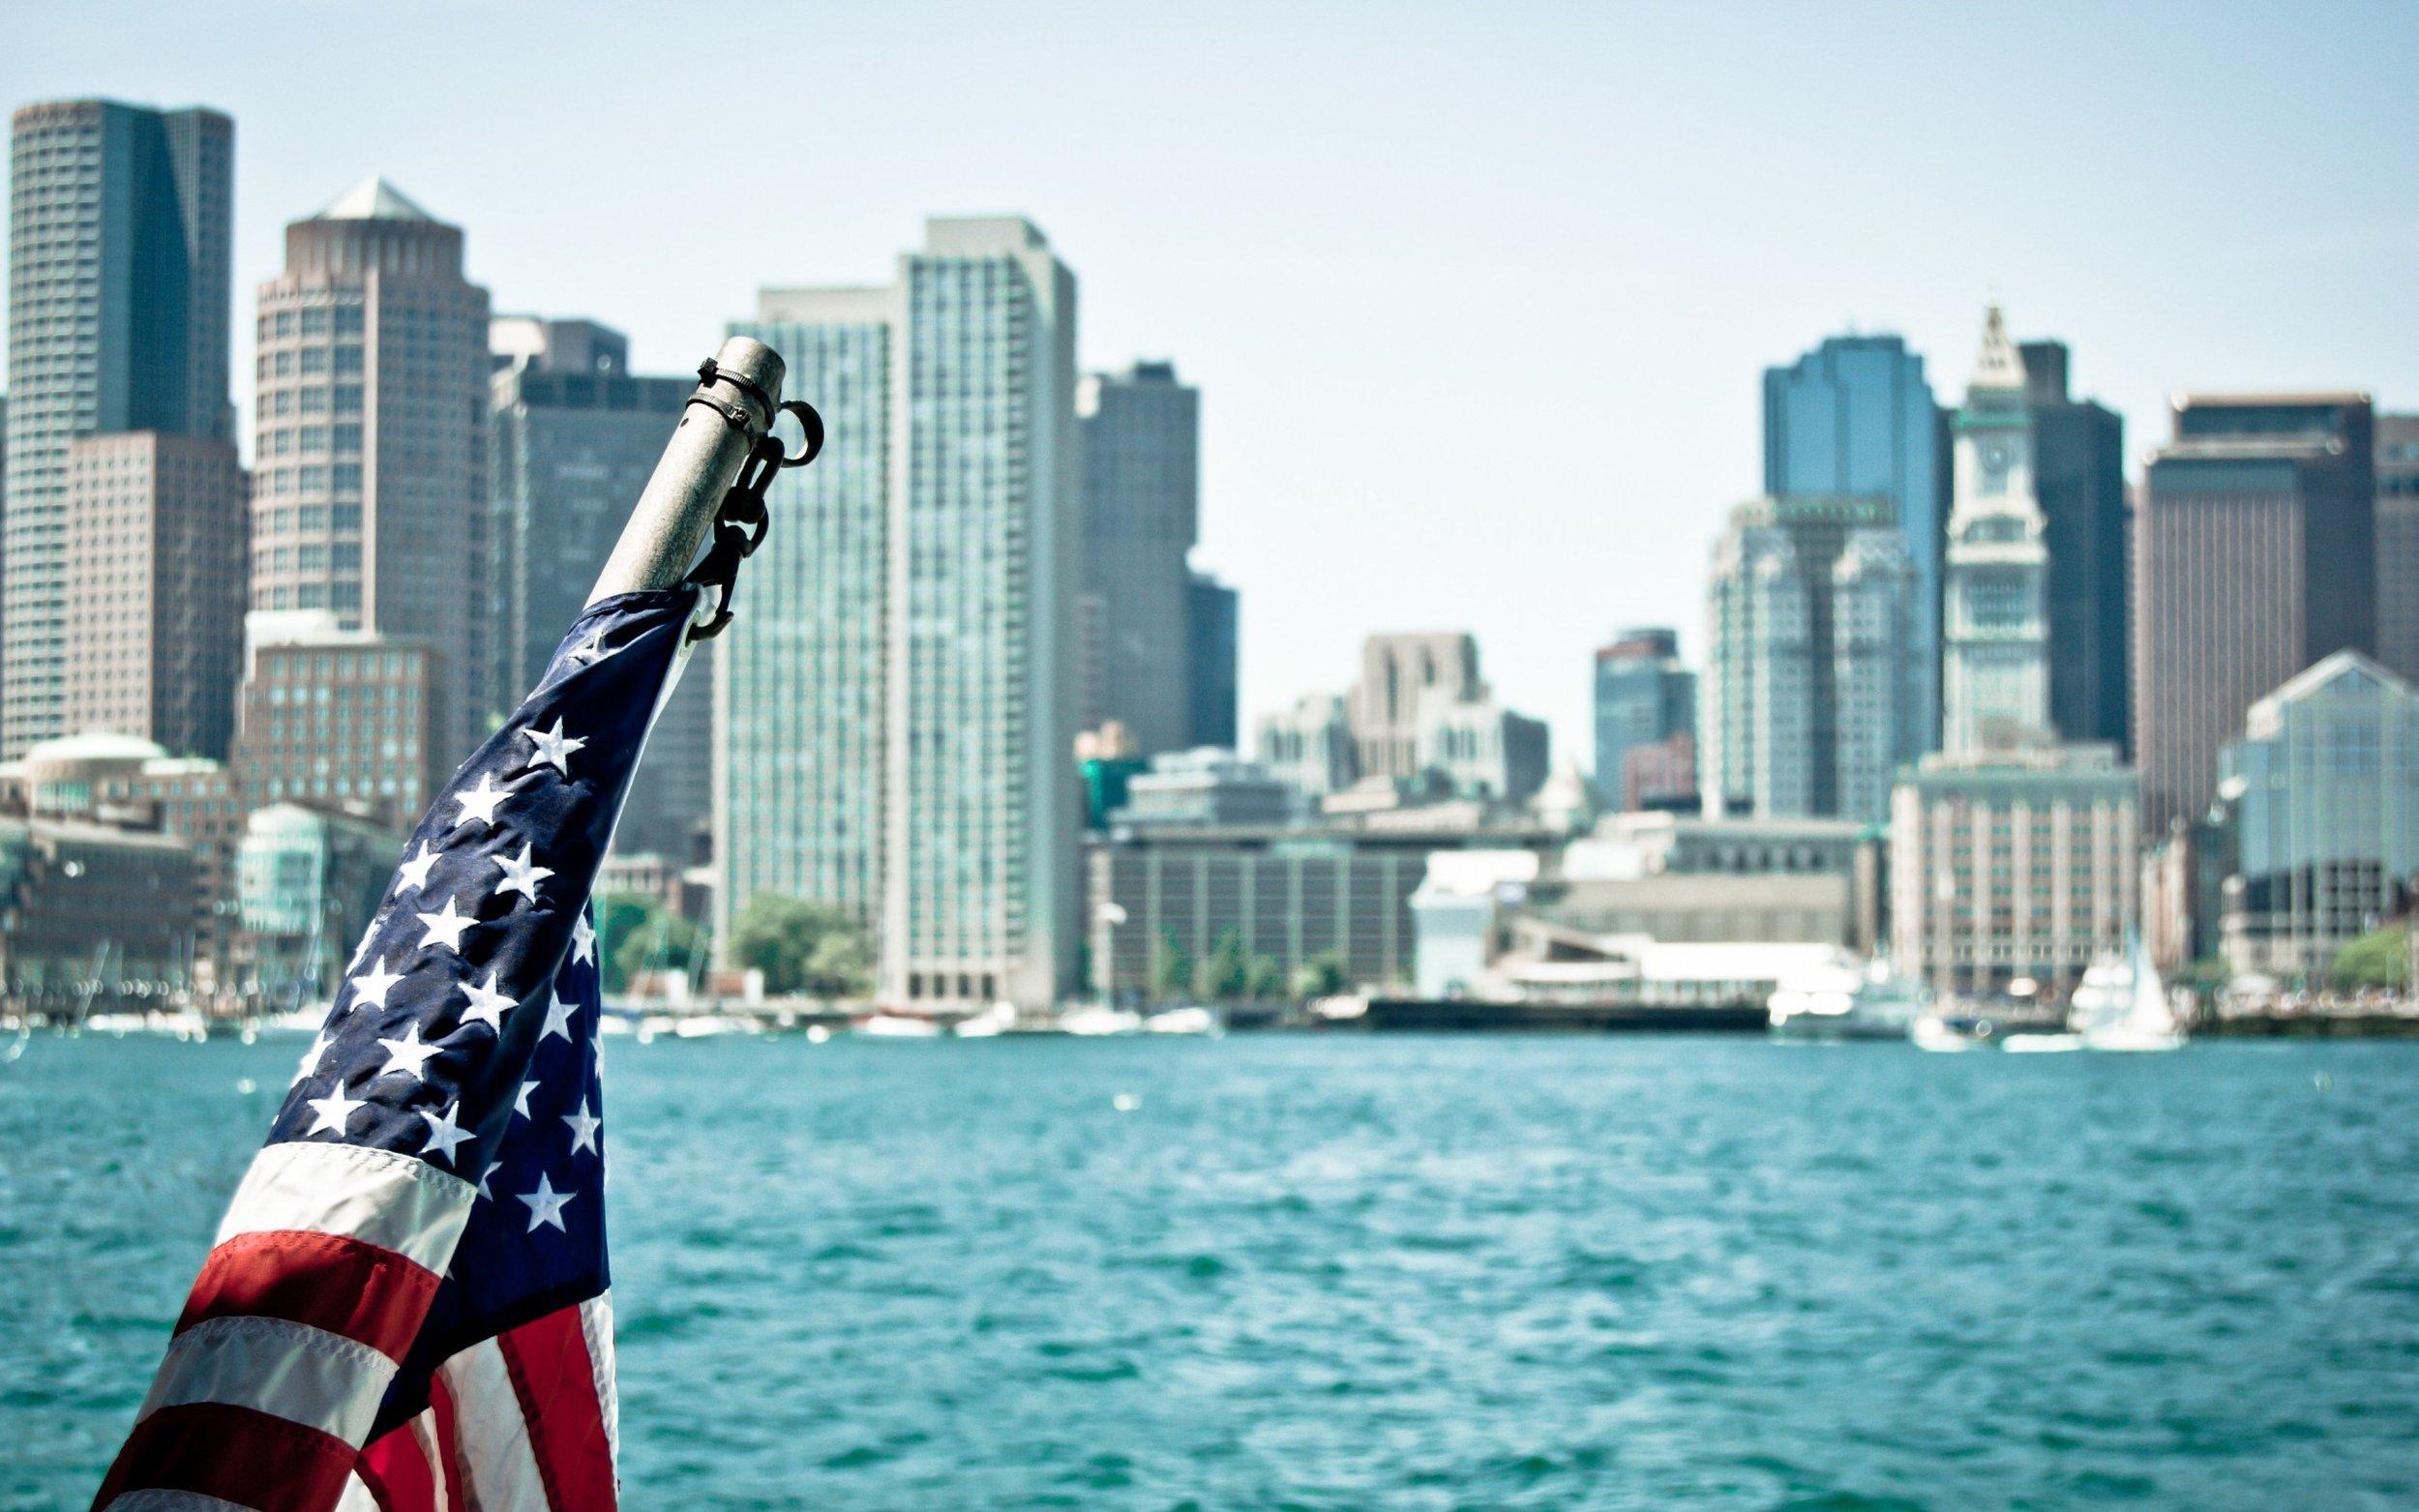 7033075-usa-massachusetts-boston-city-flag.jpg